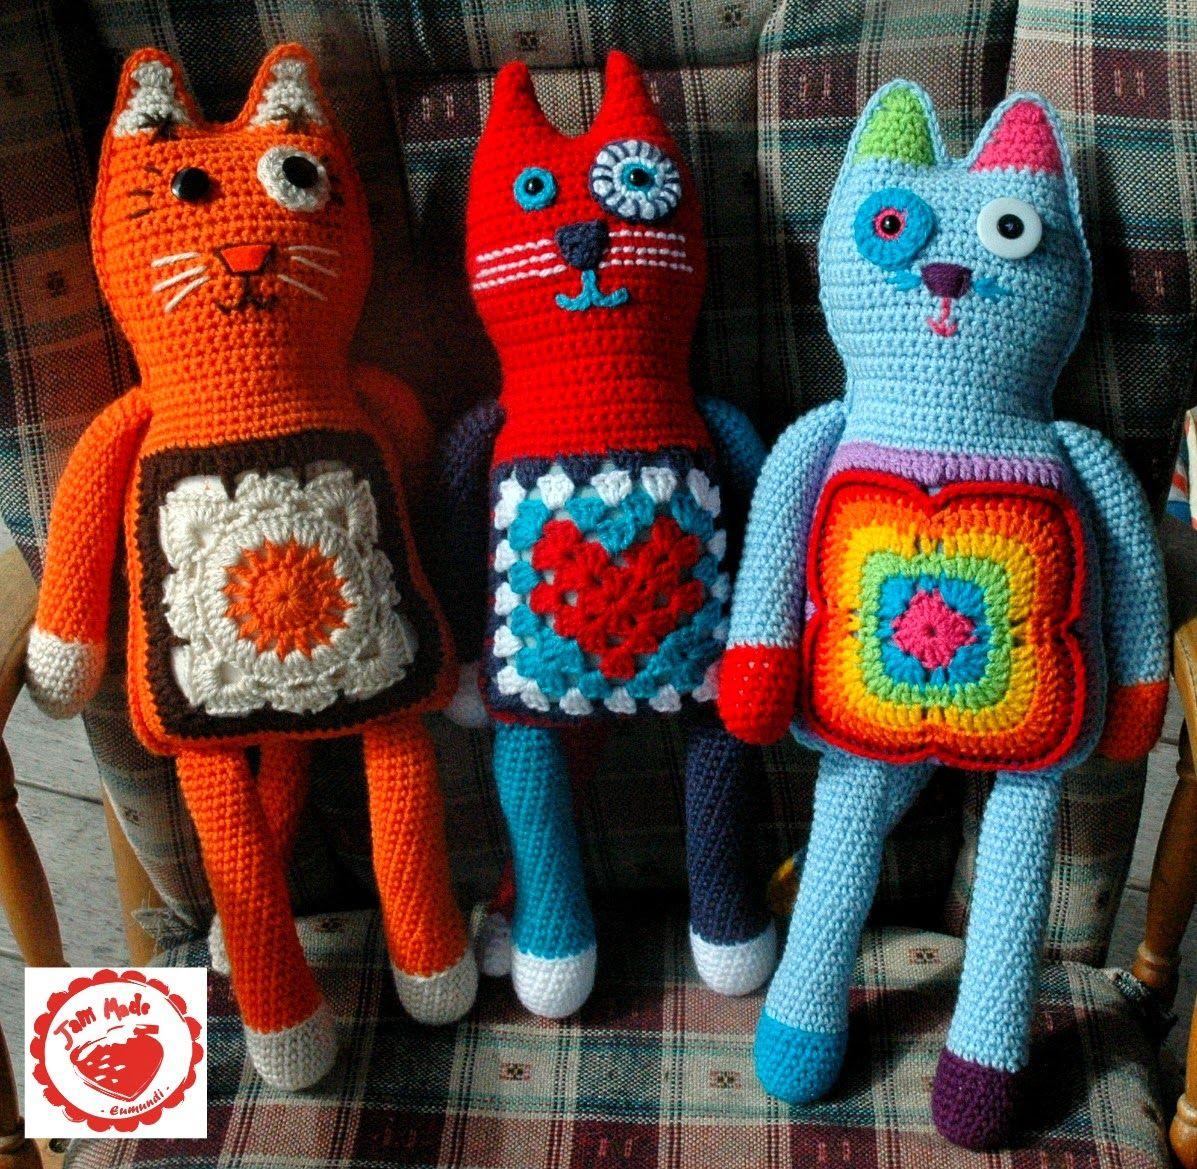 Granny Square Plush Cat Pattern Crochet projects